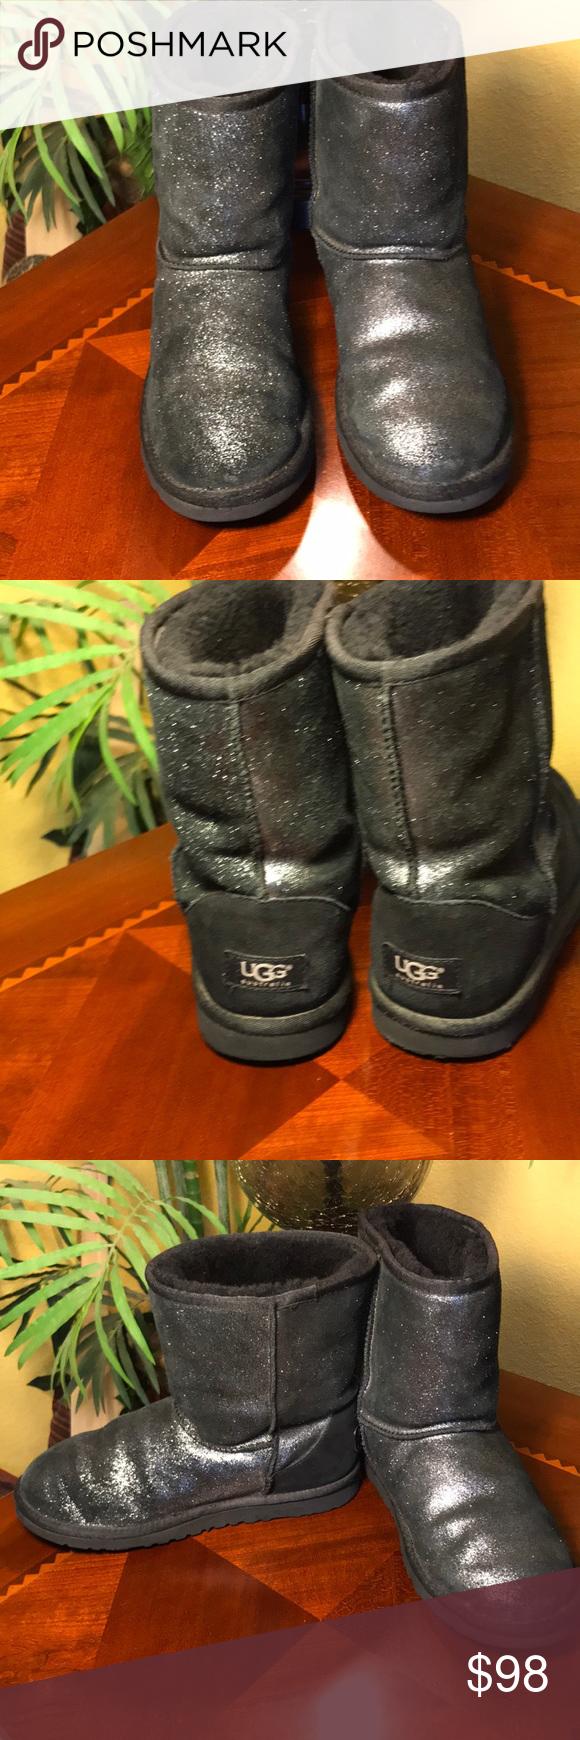 546291c5552 UGG Sparkle Black Metallic Classic Short Boots UGG Sparkle Black ...